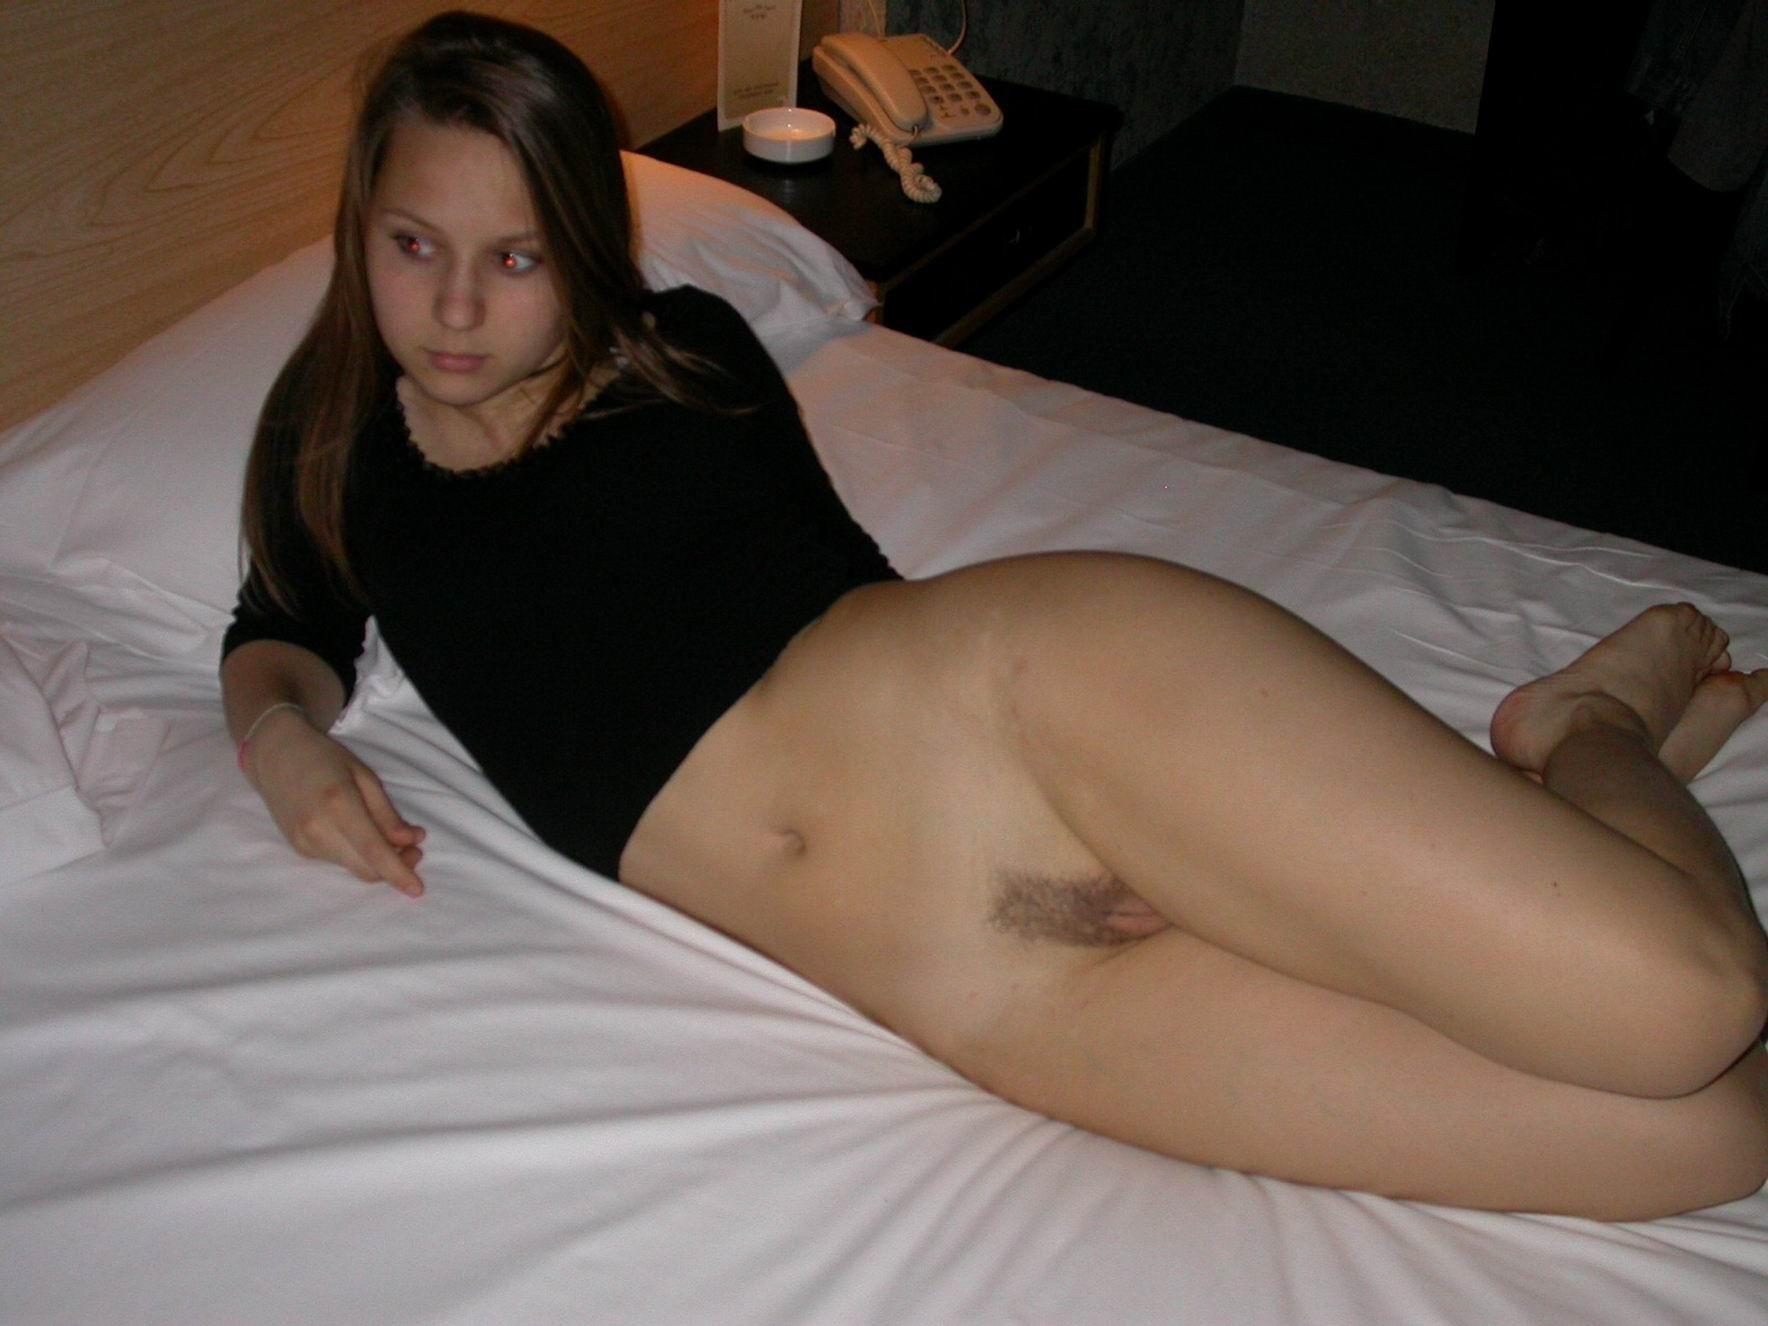 bottomless-girls-nude-mix-78